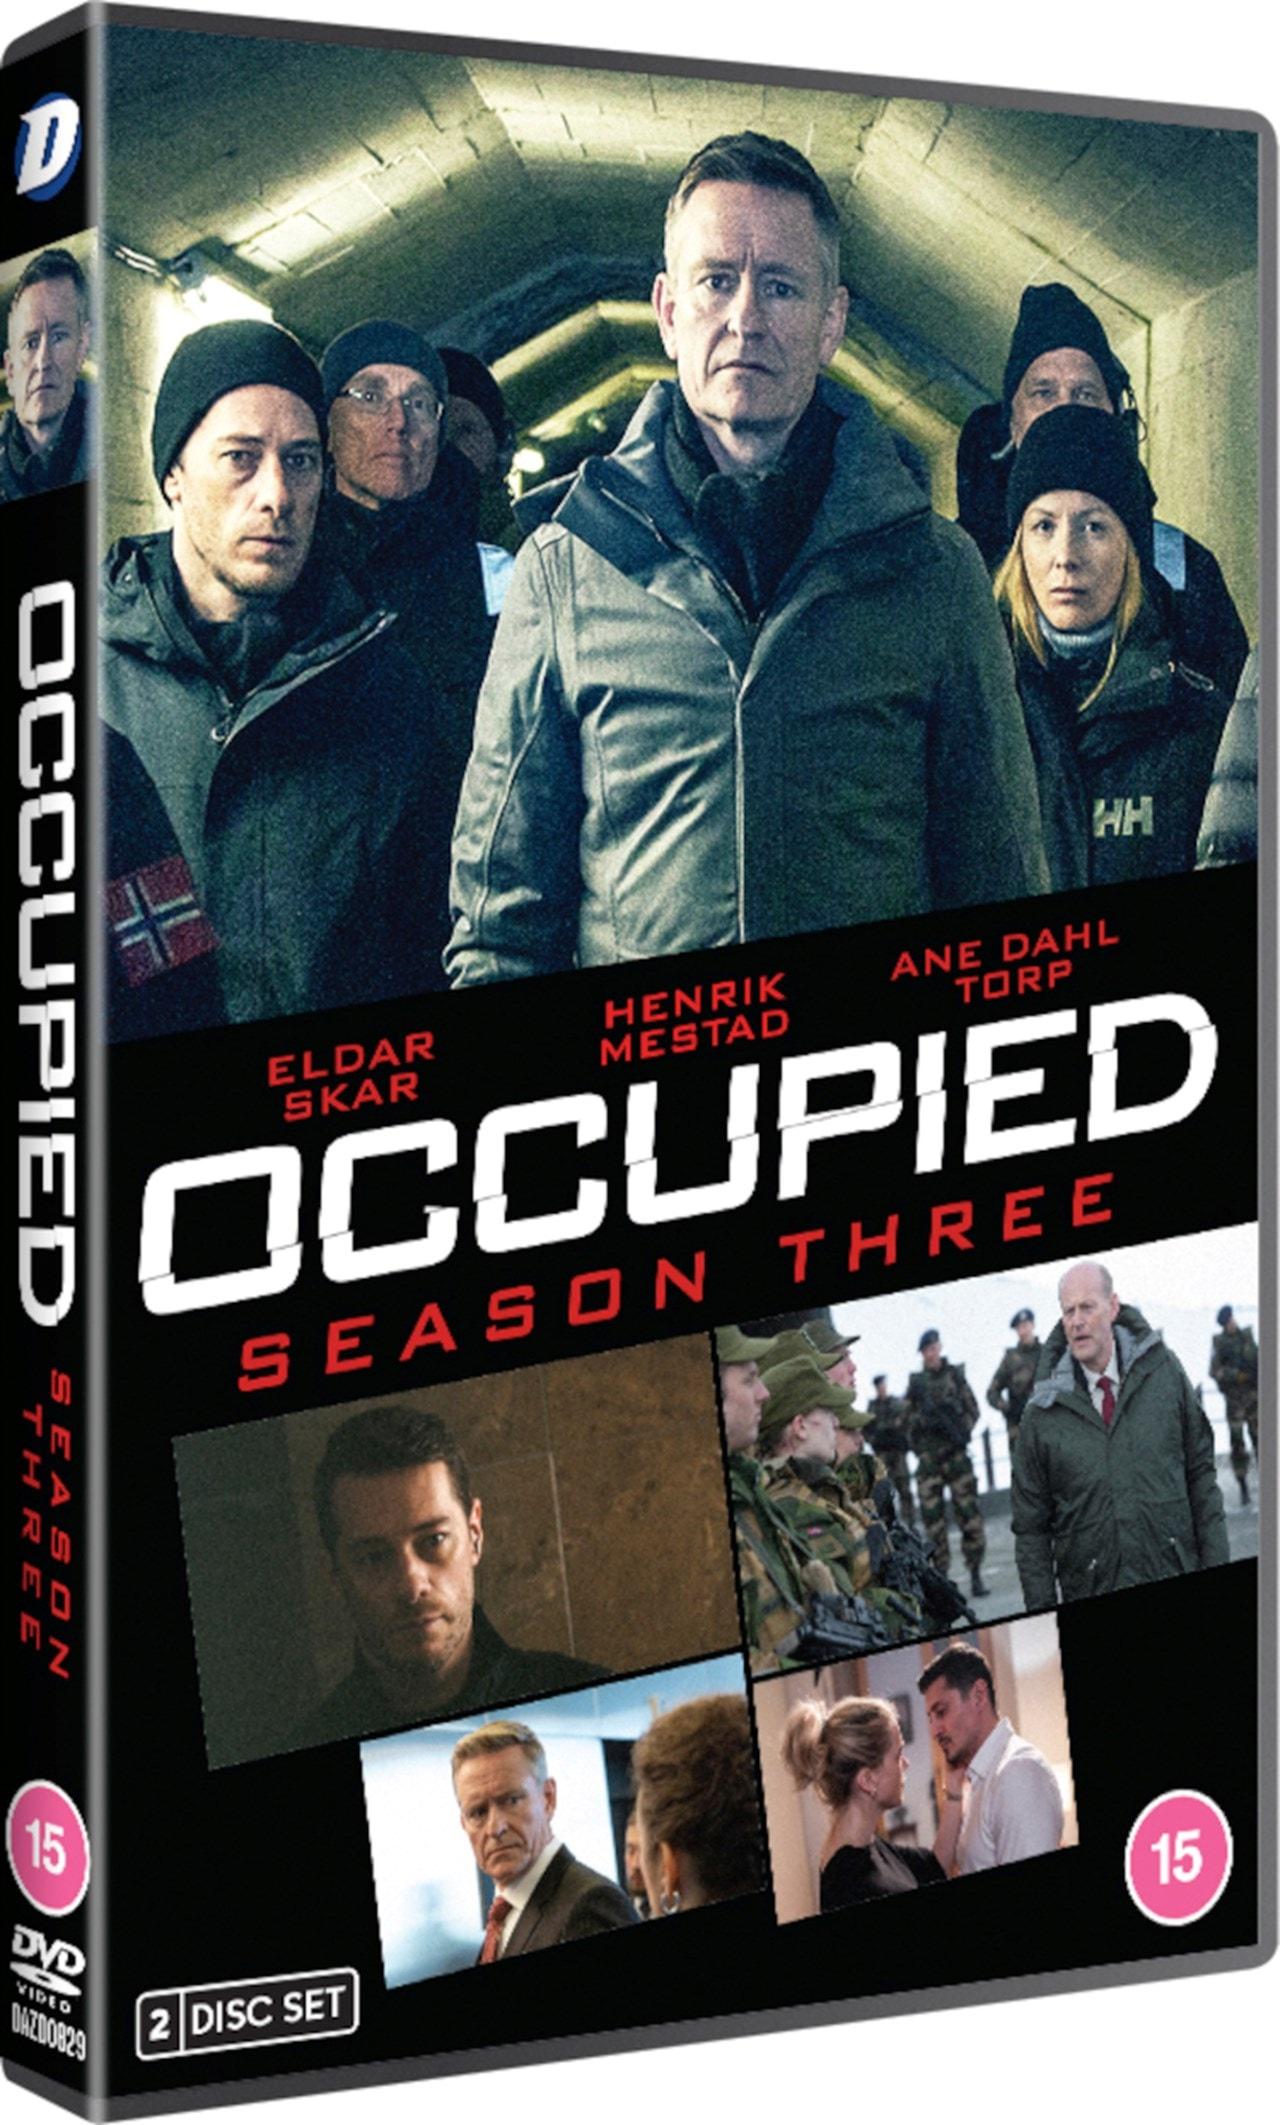 Occupied: Season 3 - 2